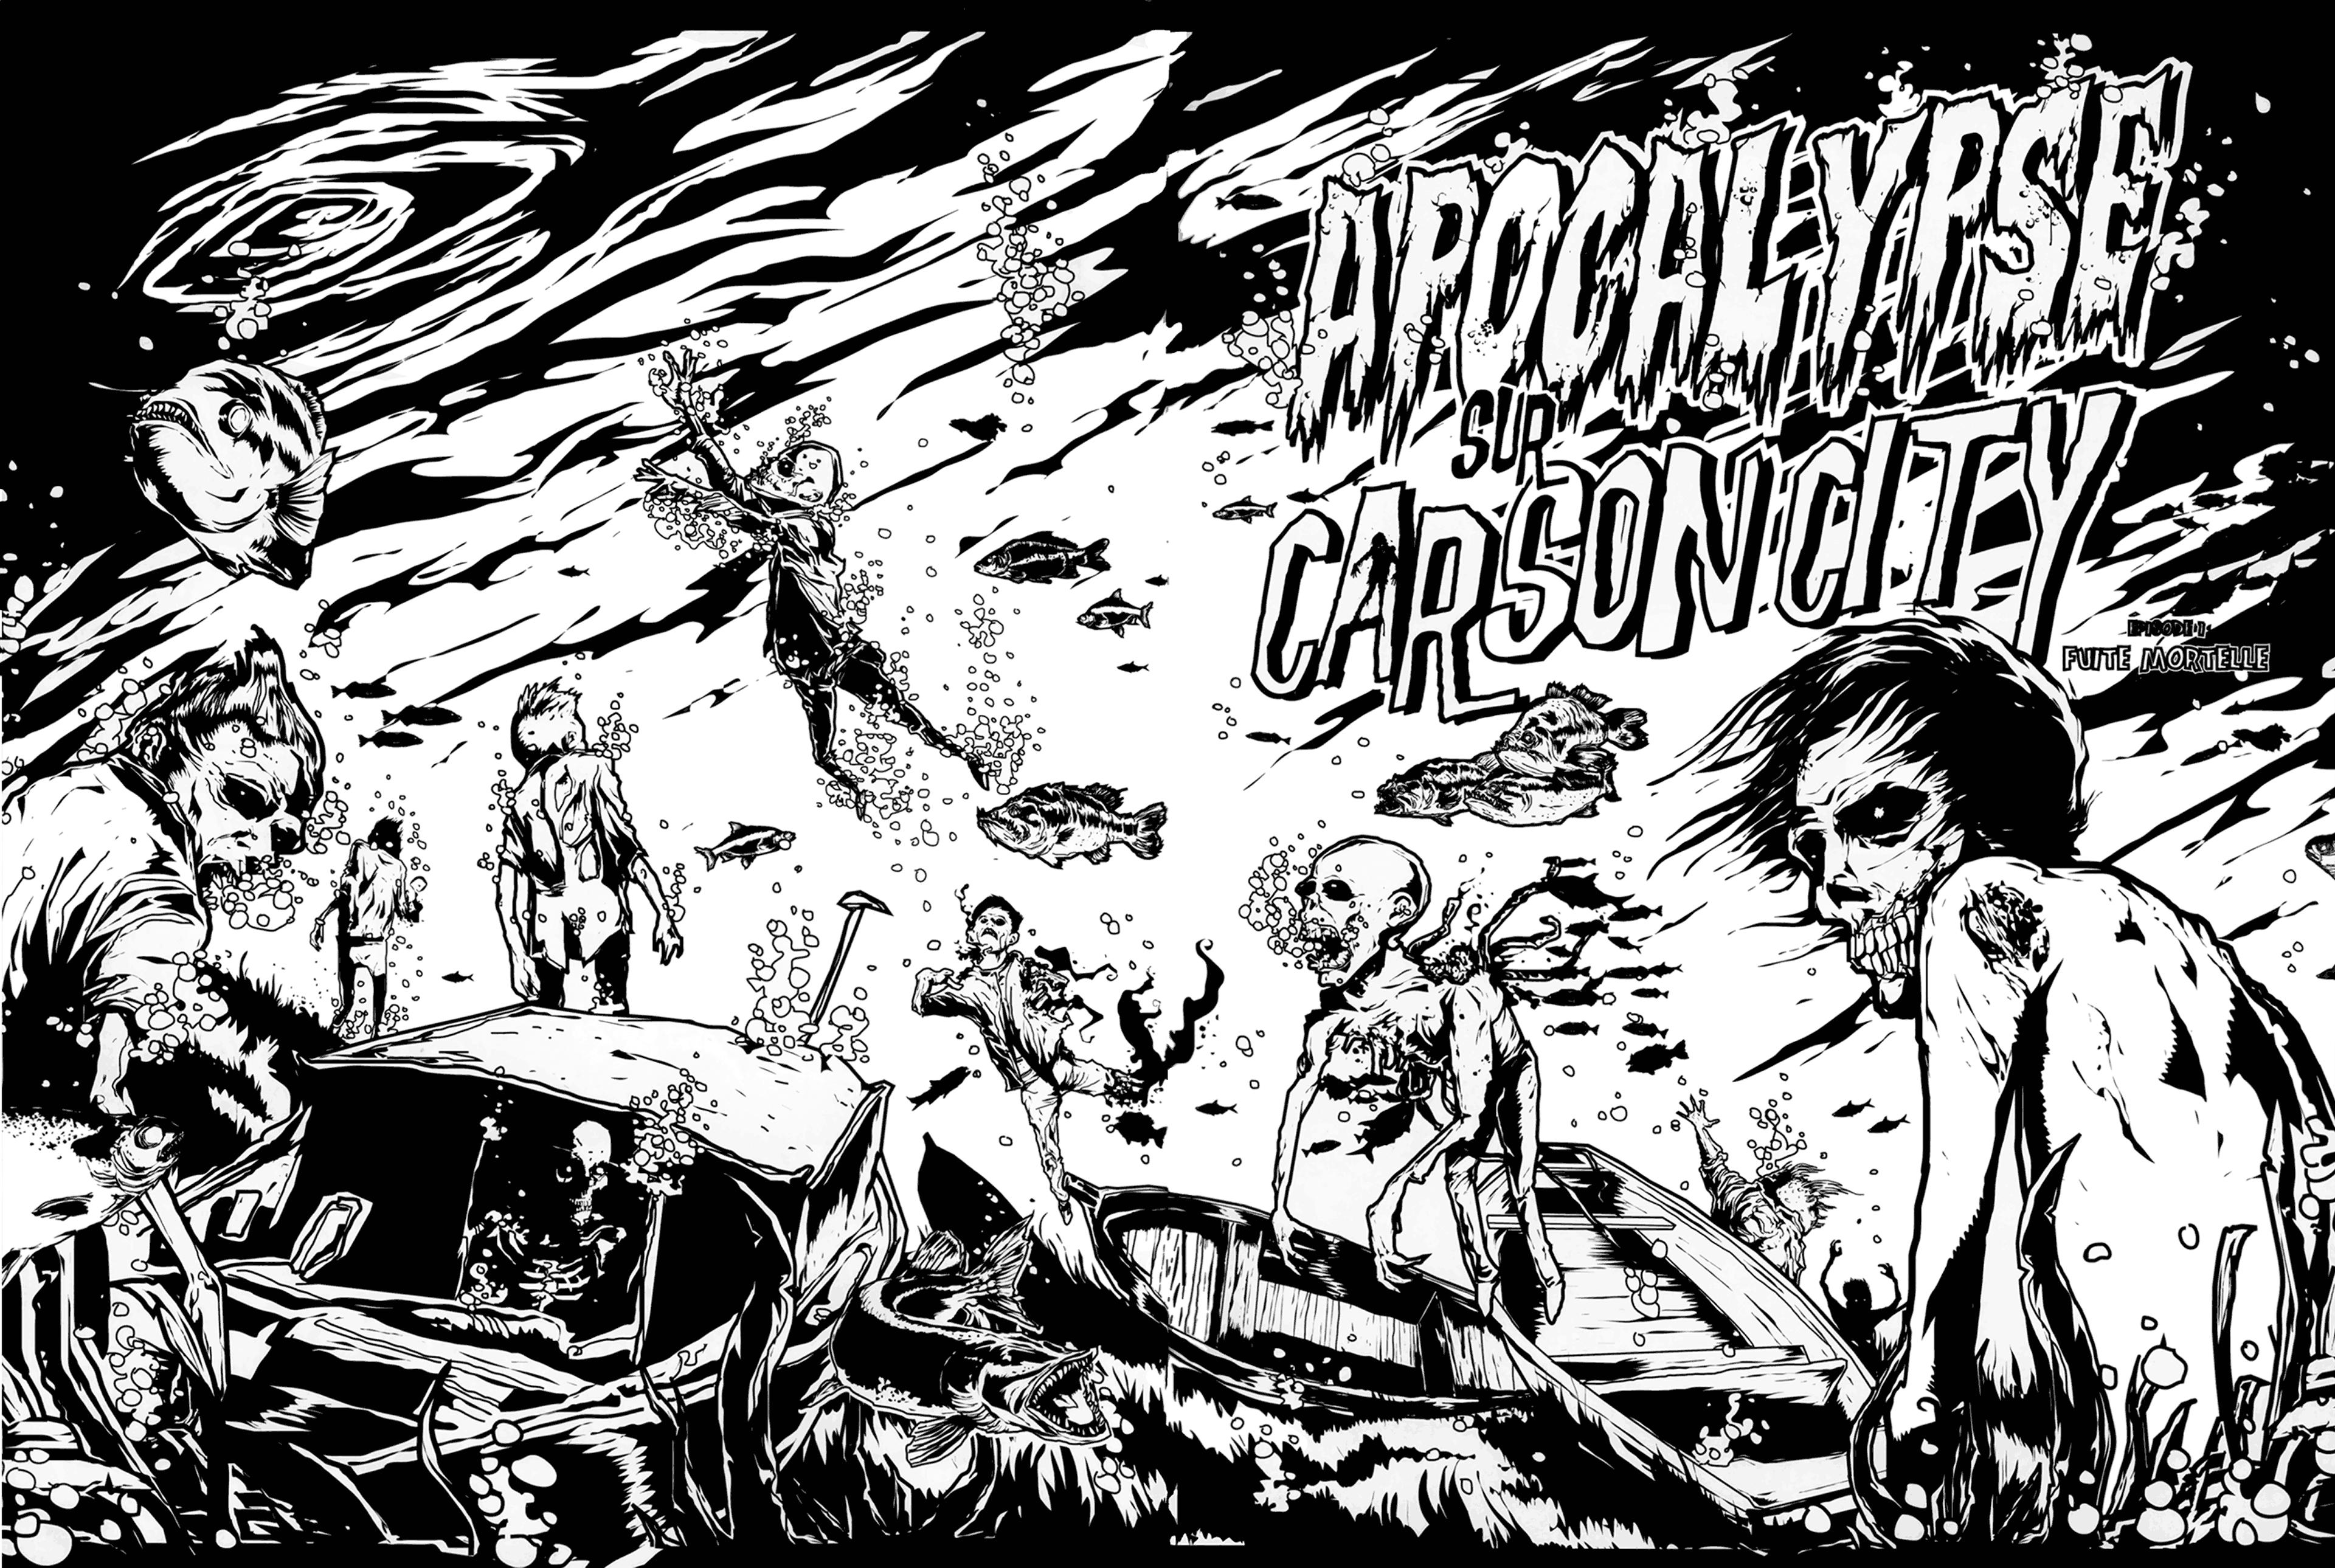 apocalypse sur carlson city